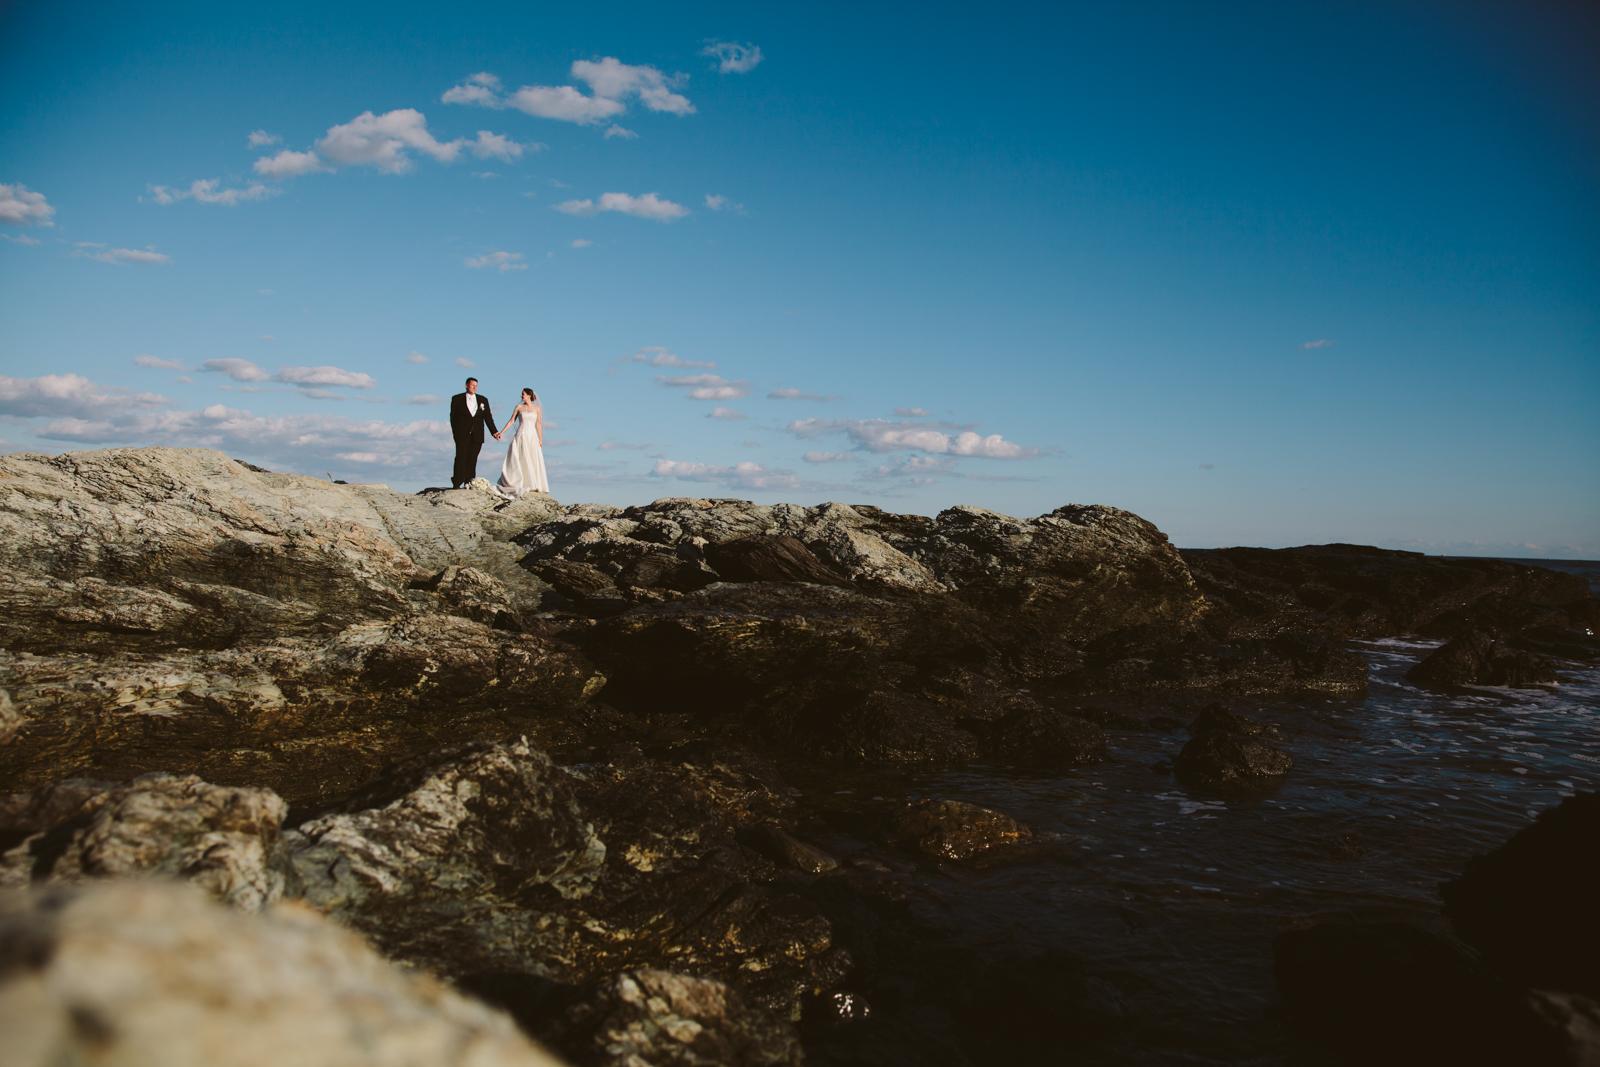 Eastons-Beach-Rotunda-Ballroom-Wedding-Newport-Rhode-Island-PhotographybyAmandaMorgan-67.jpg